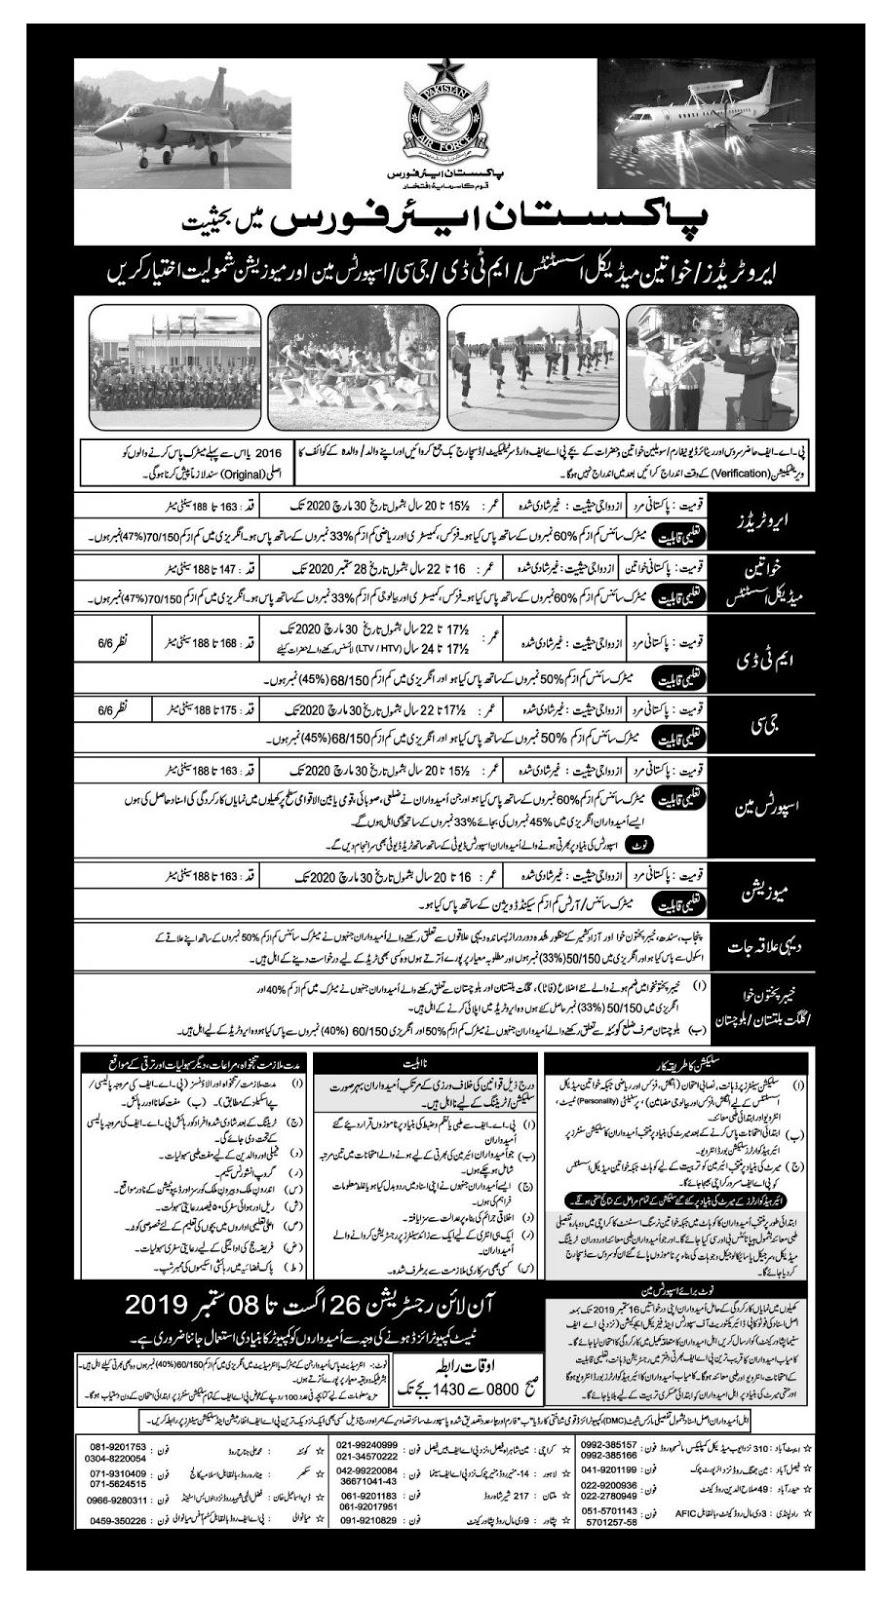 Pakistan air force jobs 26 Auguest 2019